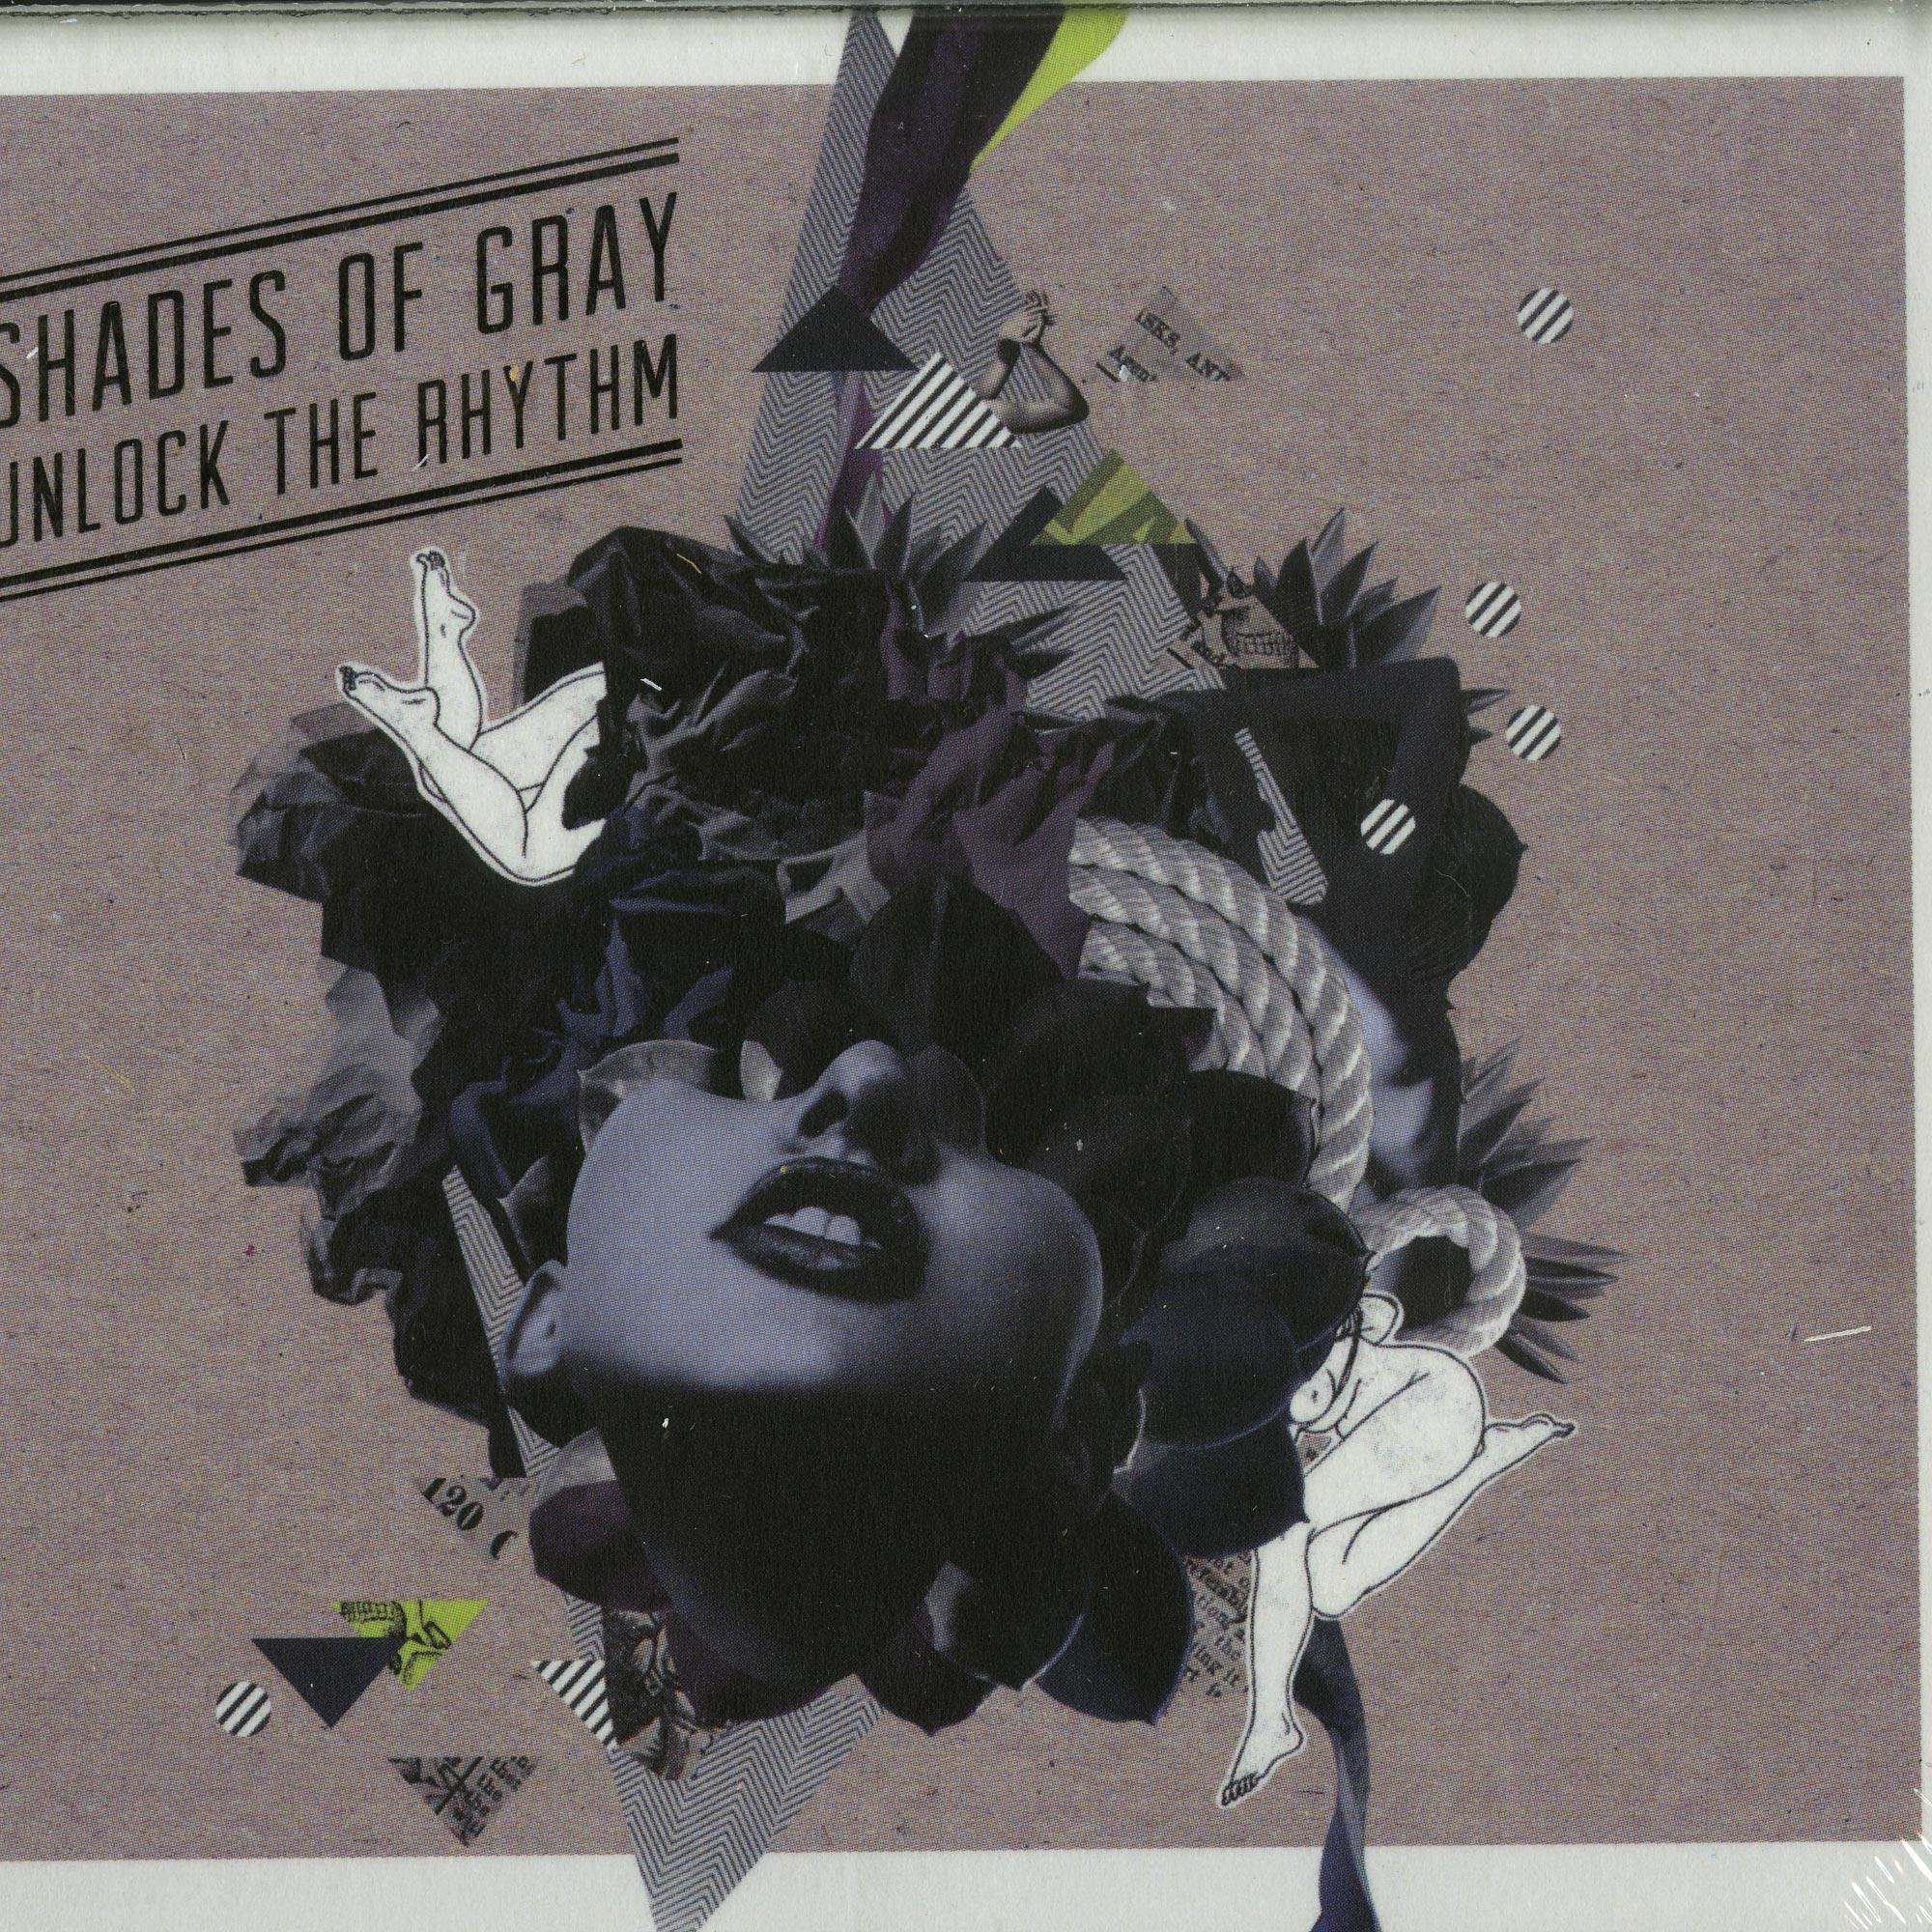 Shades Of Gray - UNLOCK THE RHYTHM